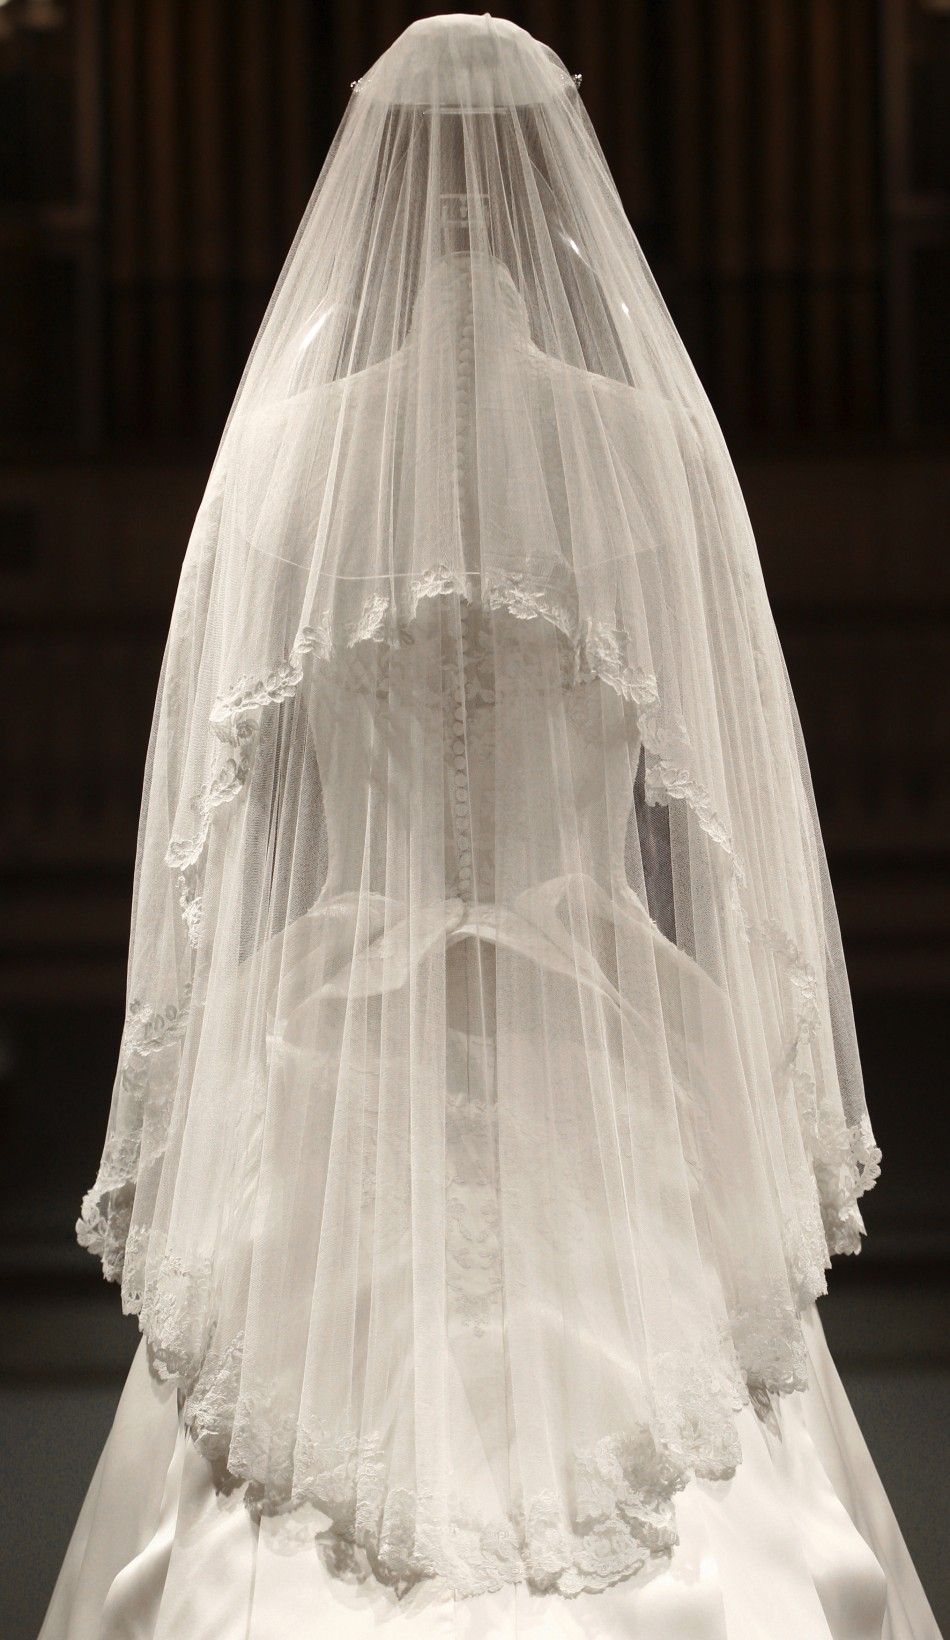 Kate S Dress Exhibited At Buckingham Palace Korolevskie Svadebnye Platya Plate Na Svadbu Svadebnye Platya [ 1640 x 950 Pixel ]